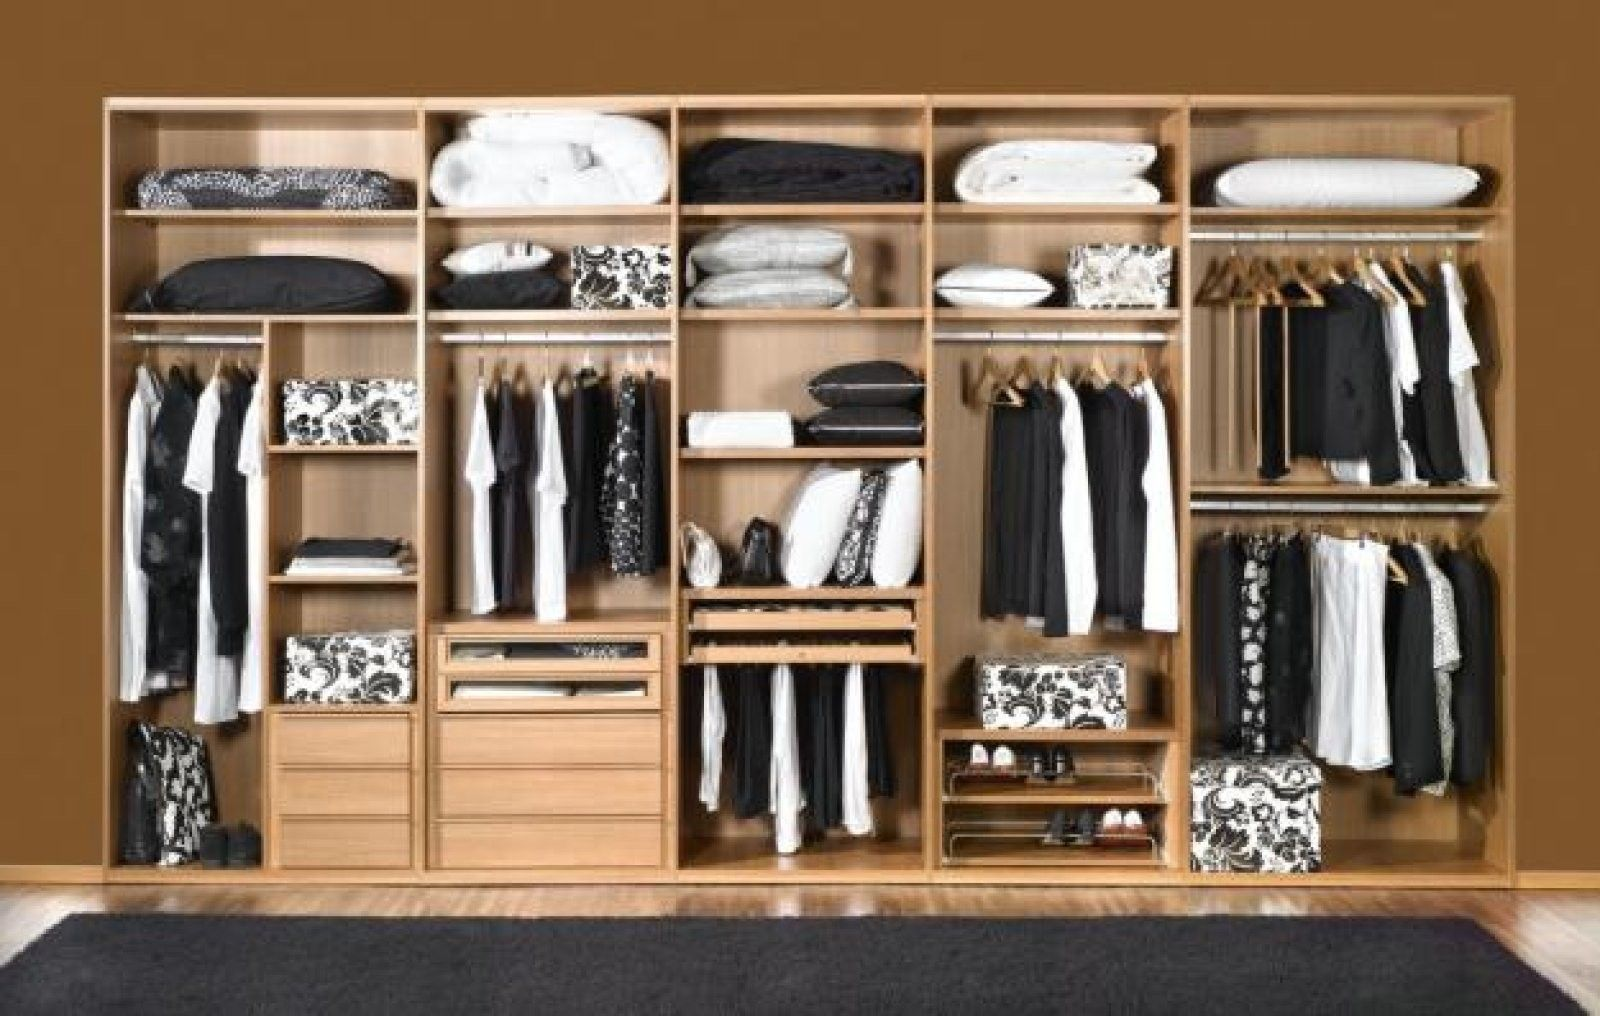 Accesorios ropa abrigos complementos zapatos los - Ikea accesorios para armarios ...